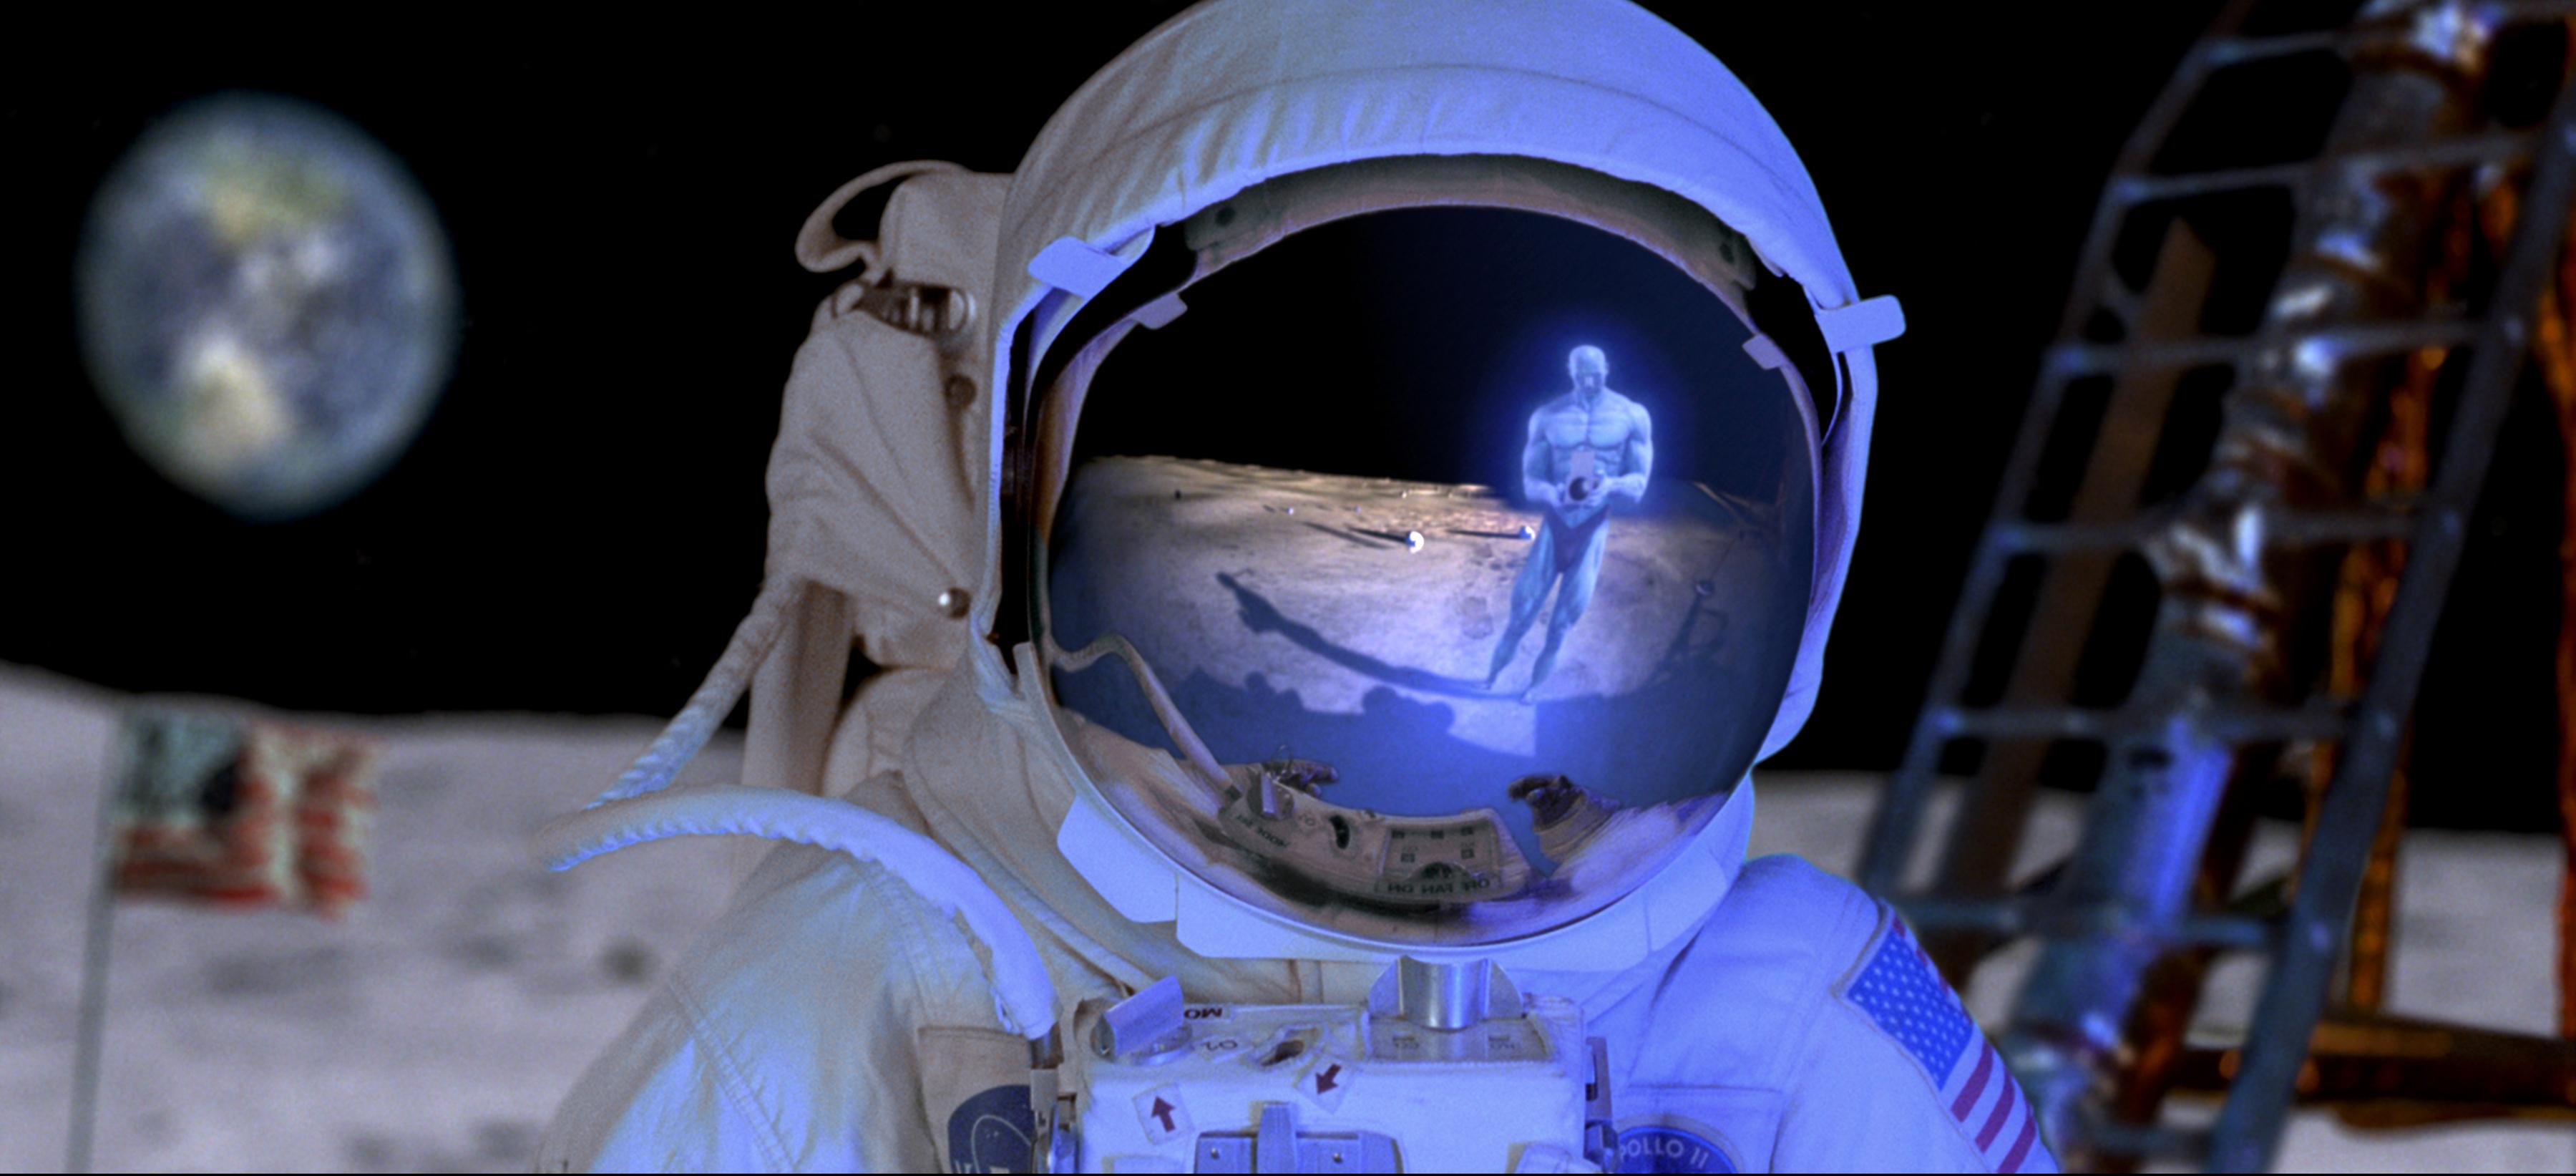 astronaut moon hd pics - photo #12